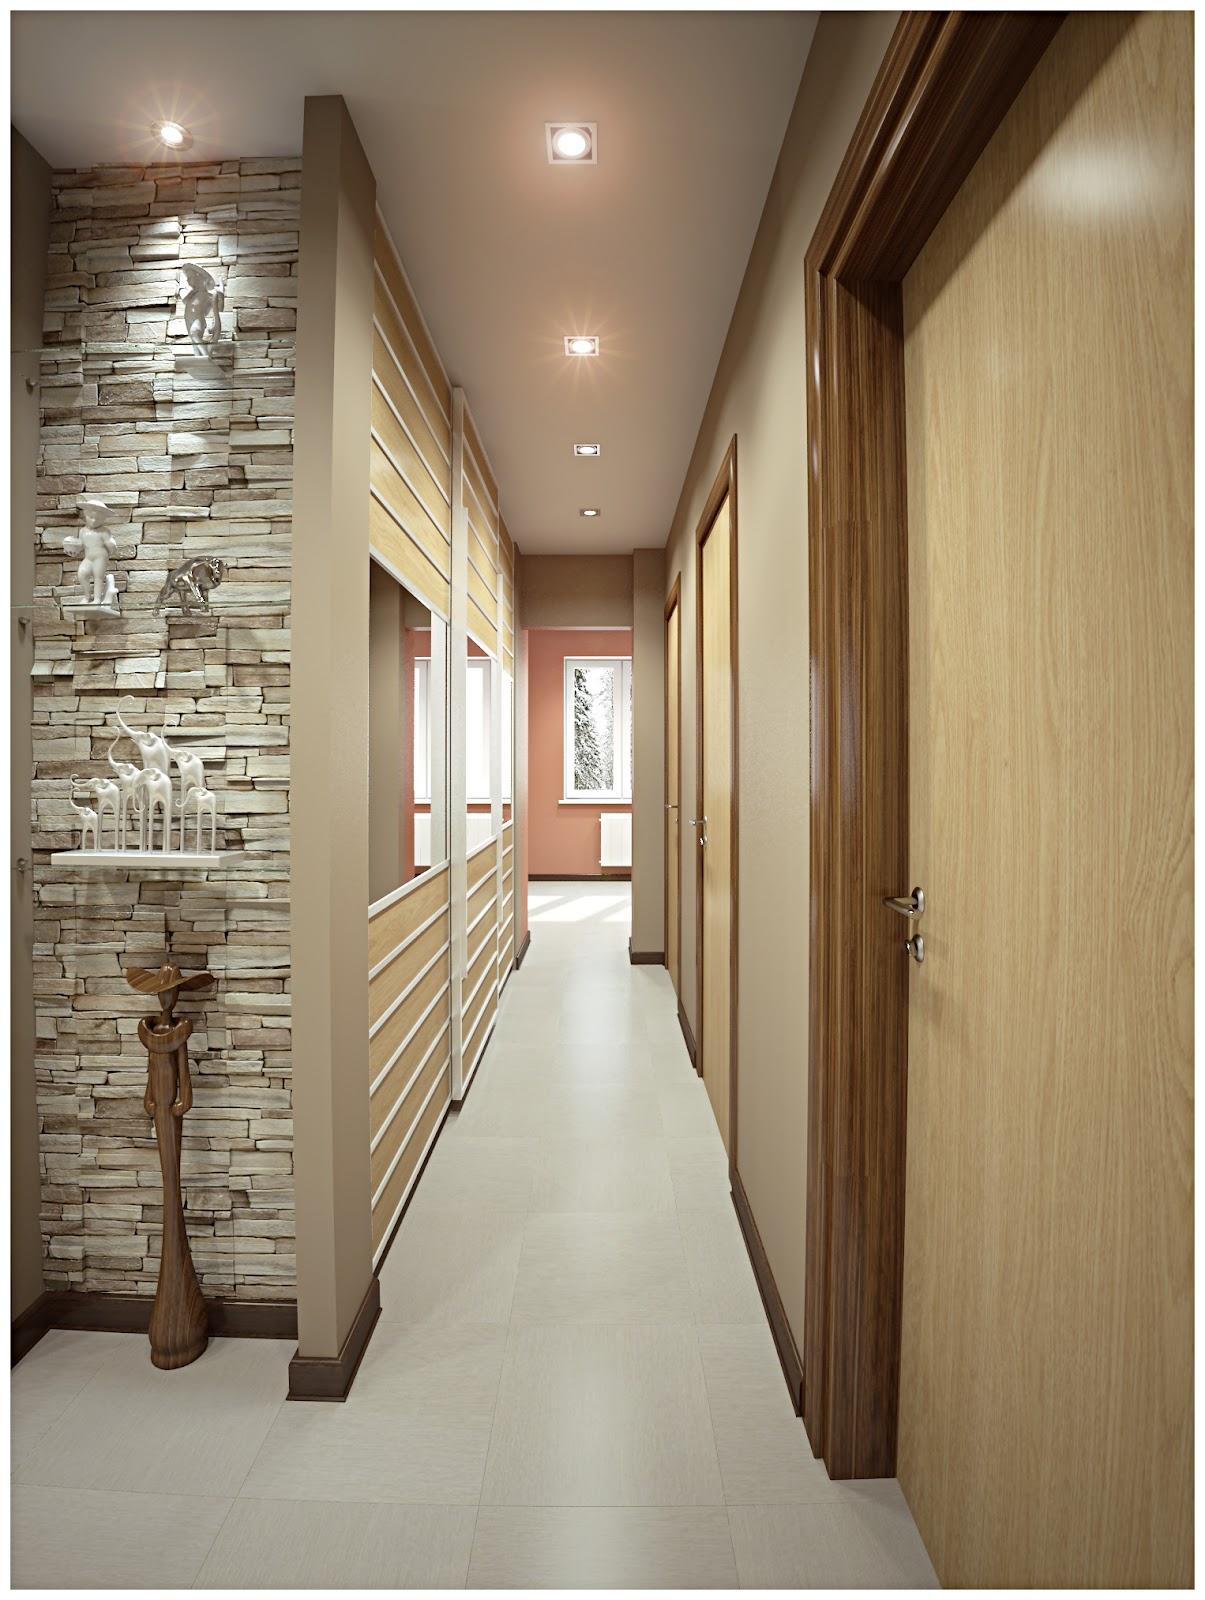 дизайн длинного узкого коридора в квартире фото меня